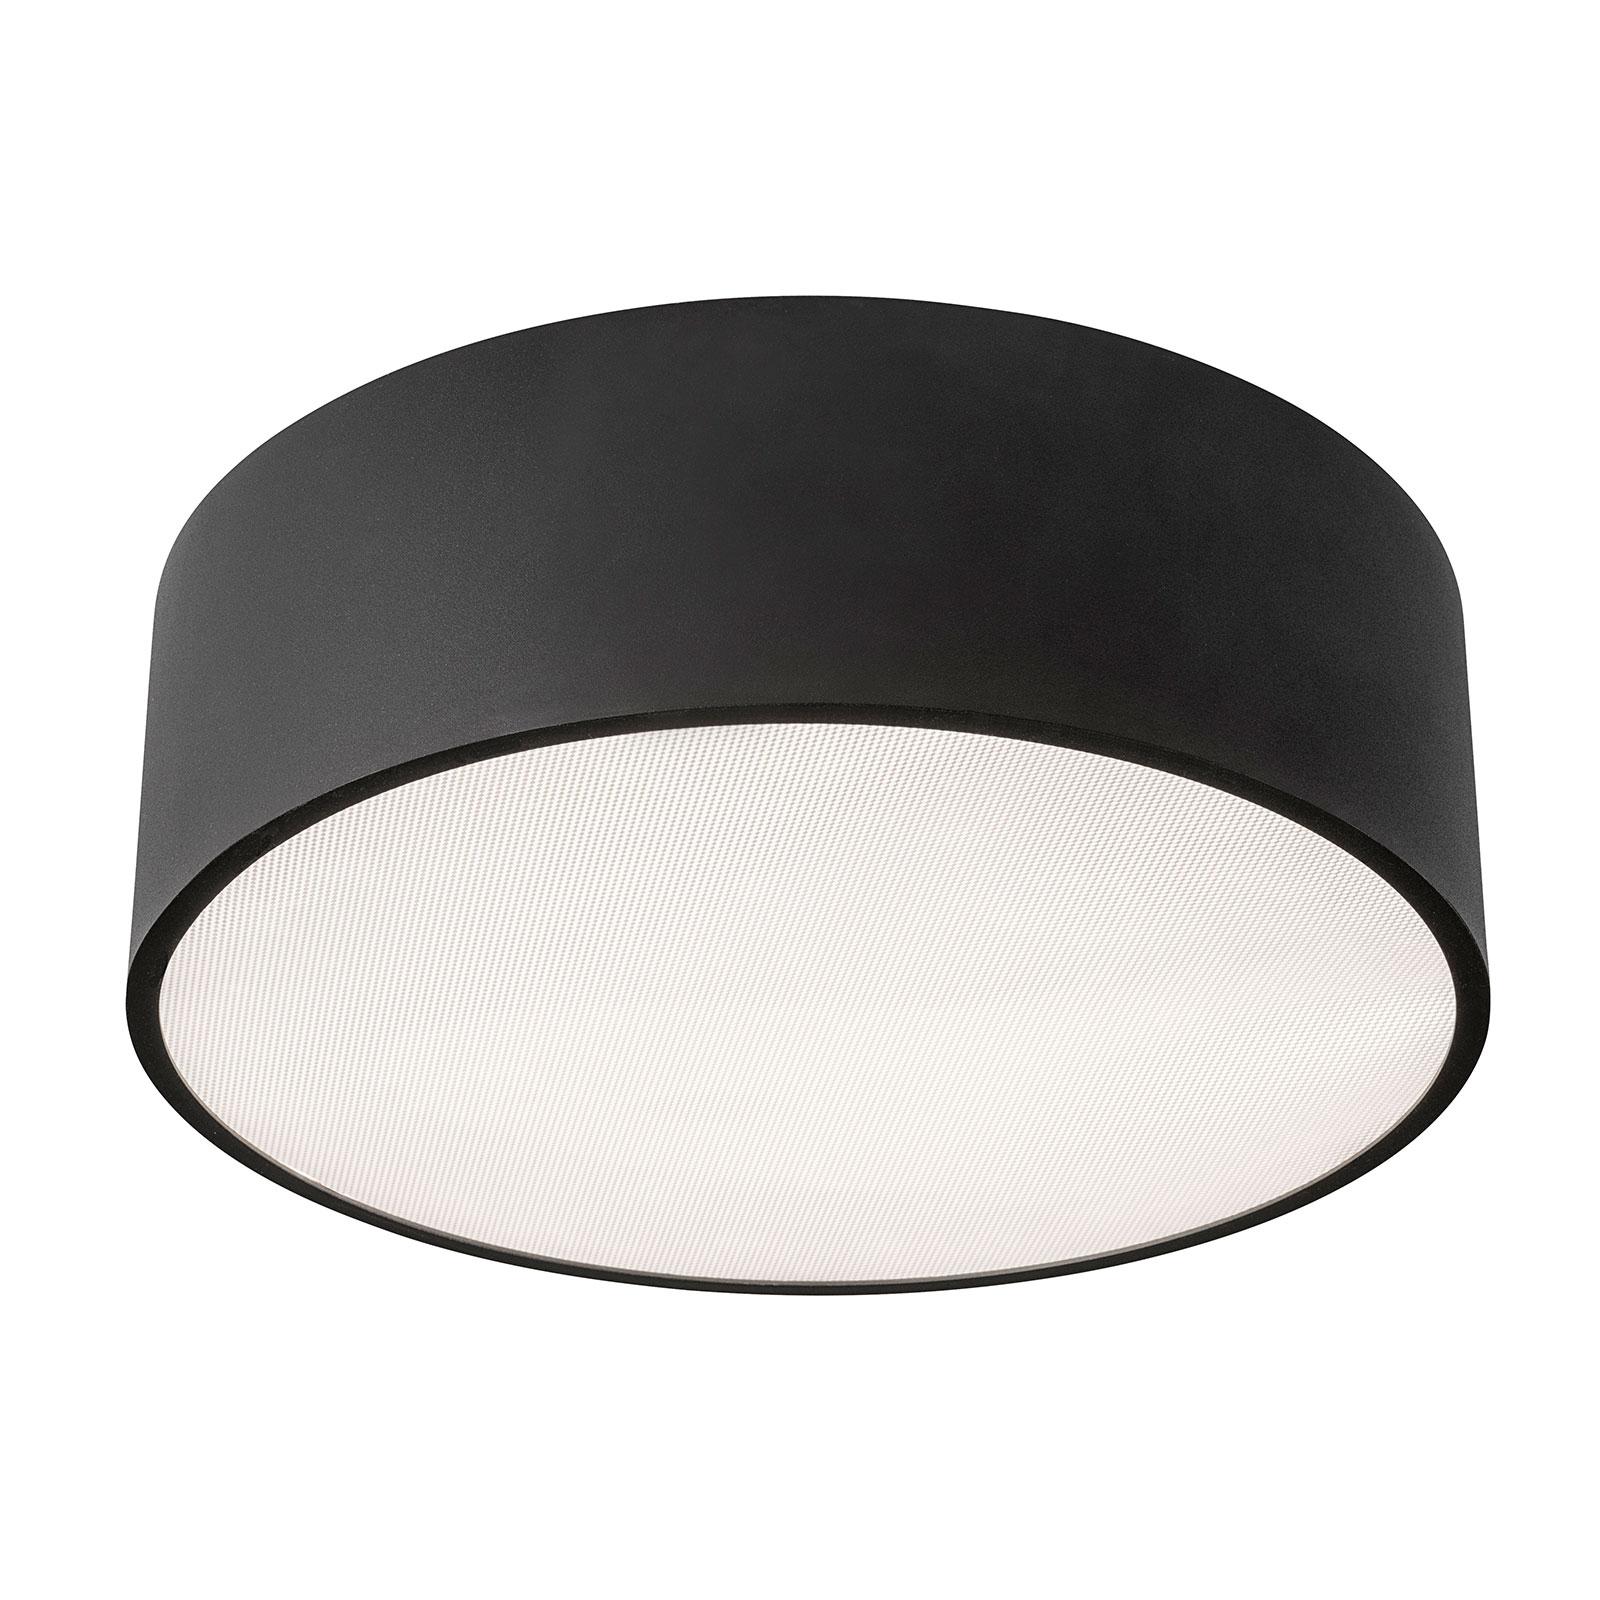 Acquista LEDS-C4 Luno plafoniera LED